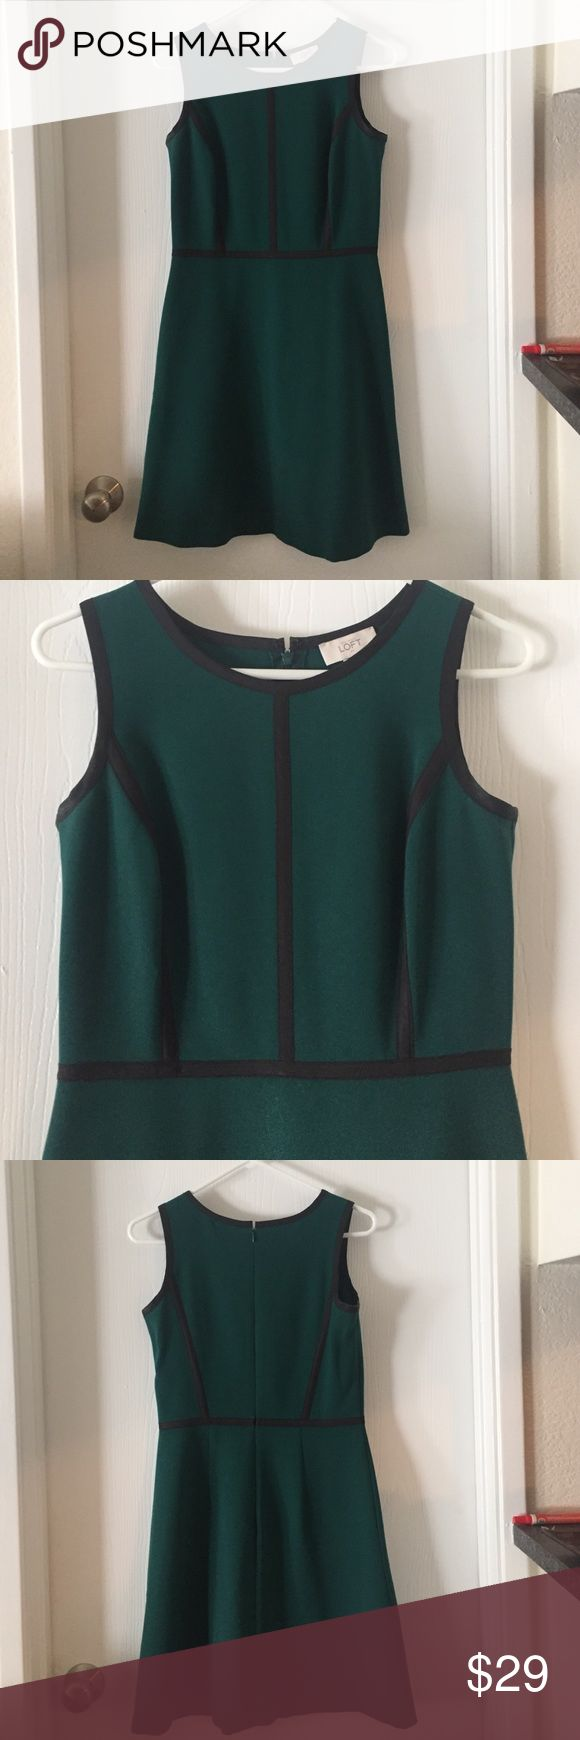 Green and black Loft dress Hunter green Loft dress with black detail LOFT Dresses